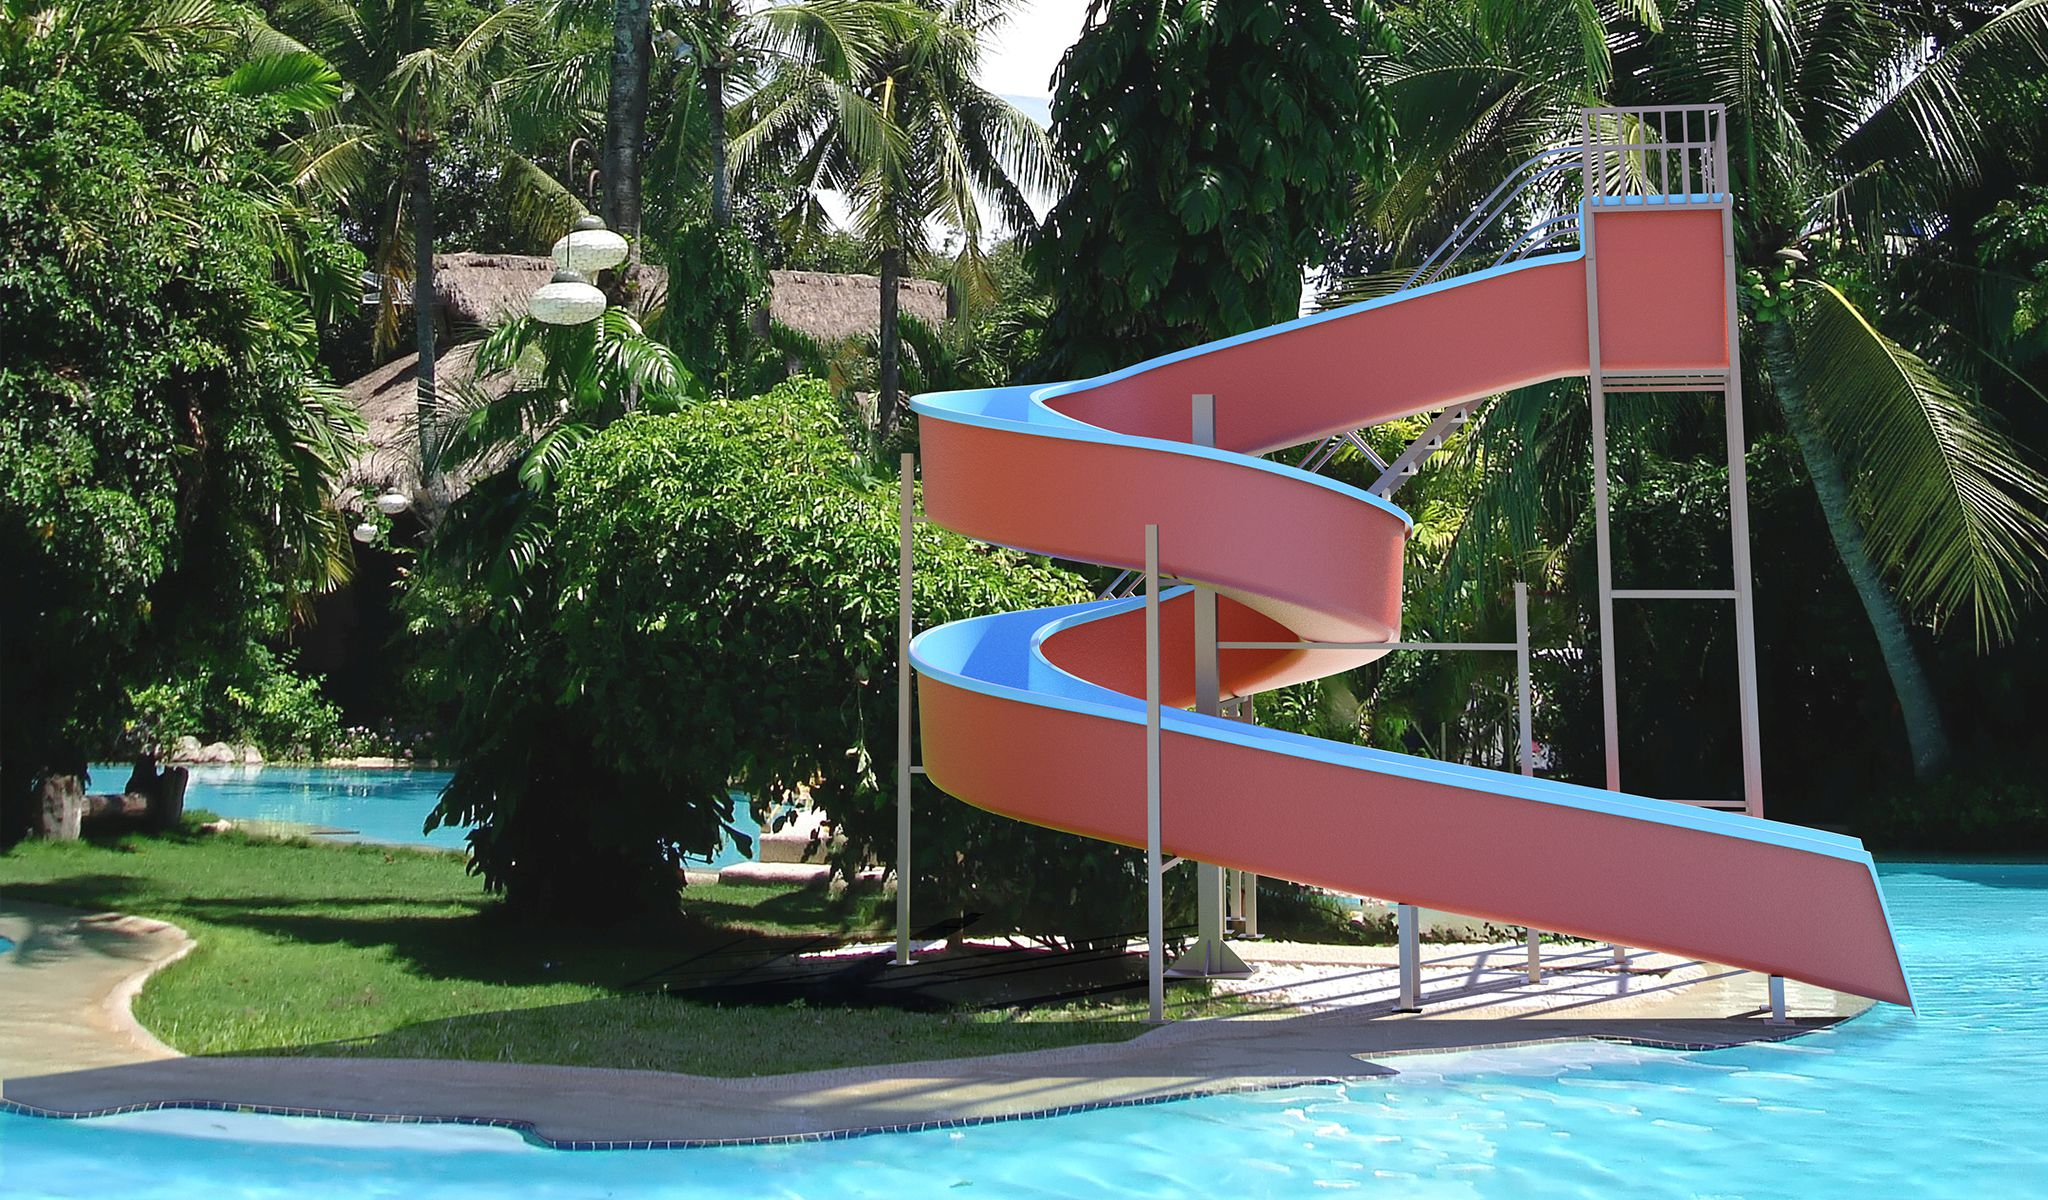 Produto2 ld16 lider piscinas for Lider piscinas